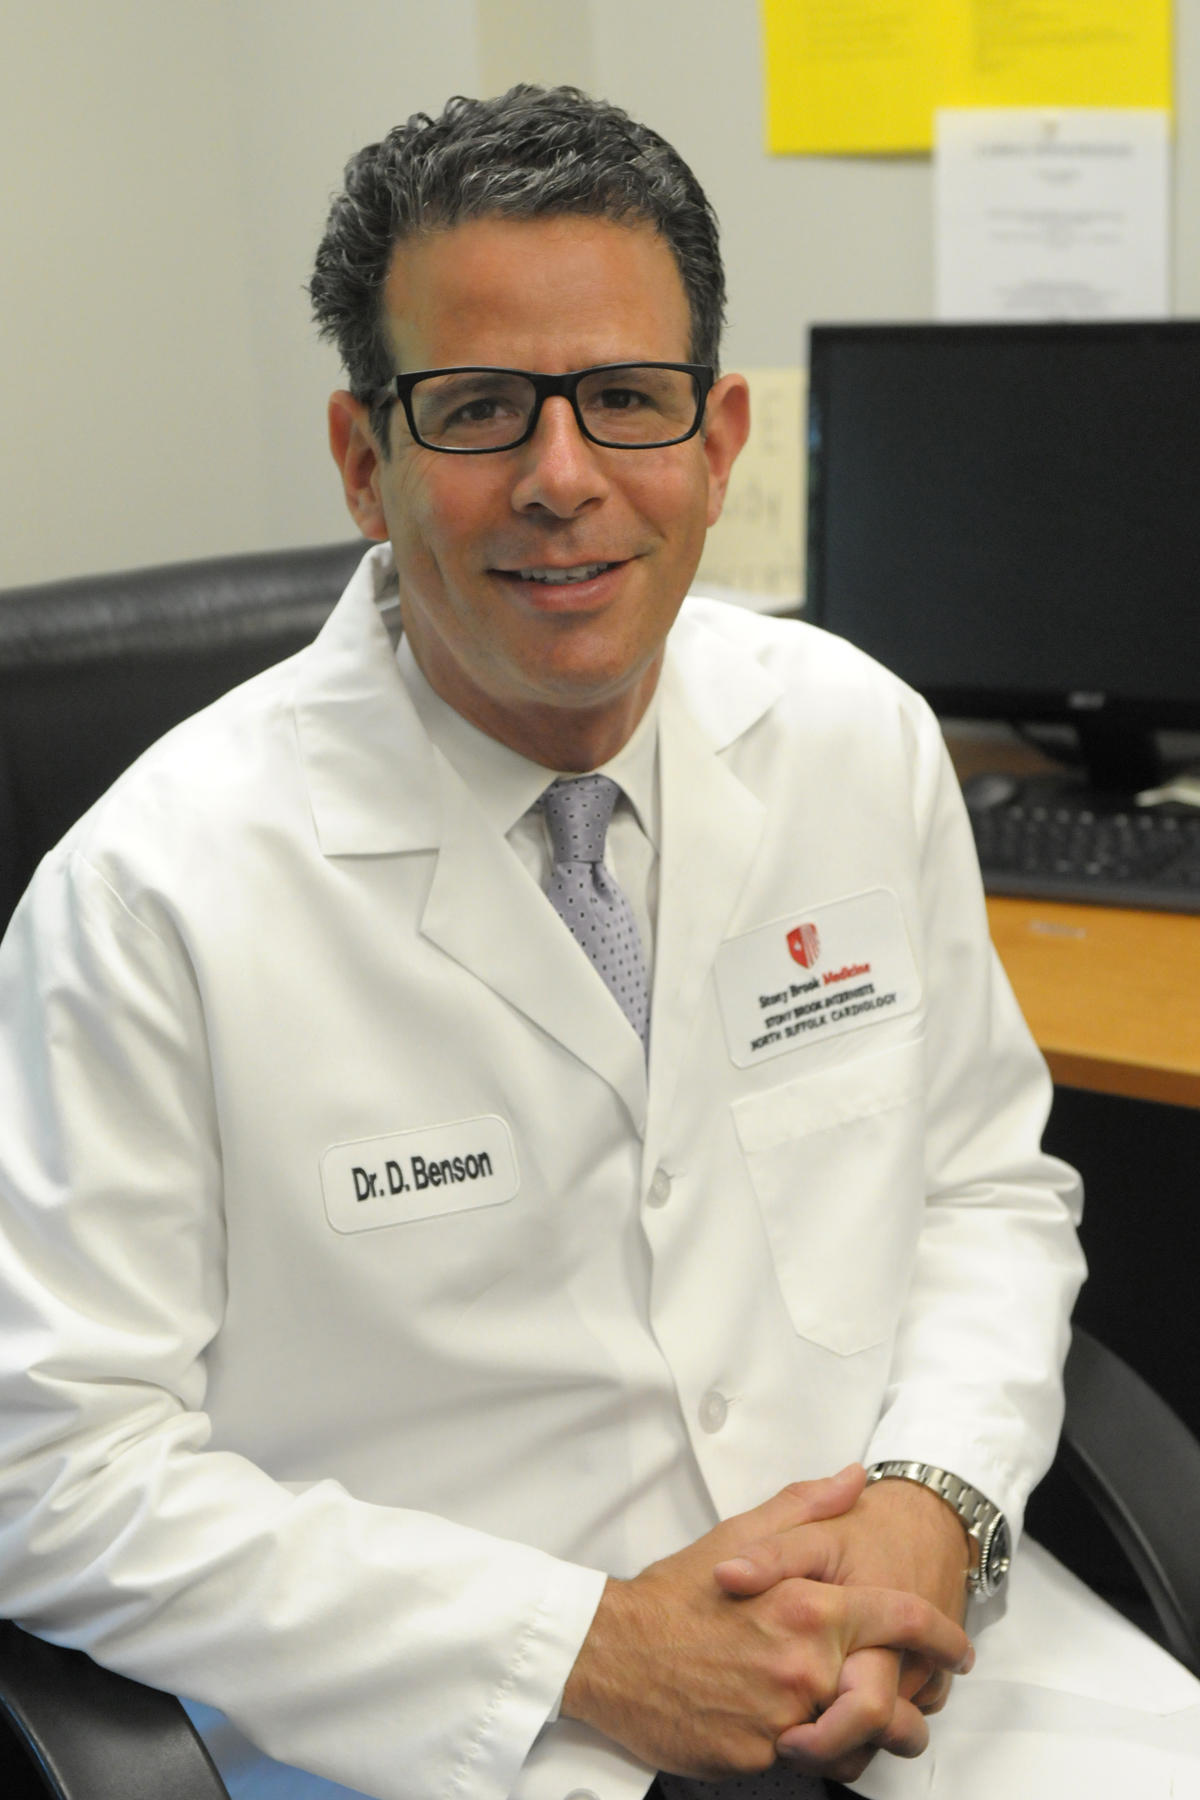 David Benson, MD